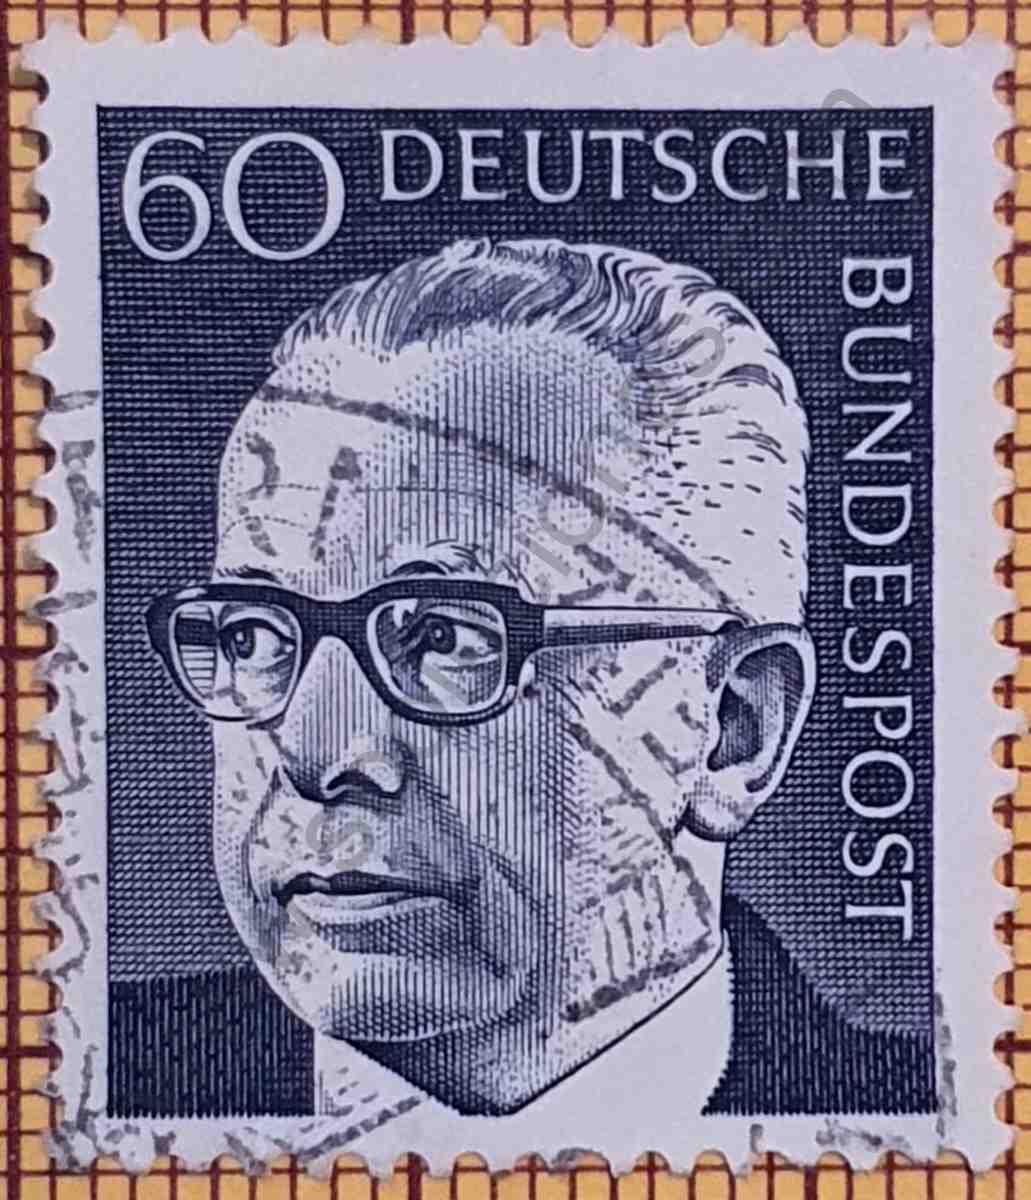 Dr. Gustav Heinemann 60Pf - Estampilla de Alemania de 1971